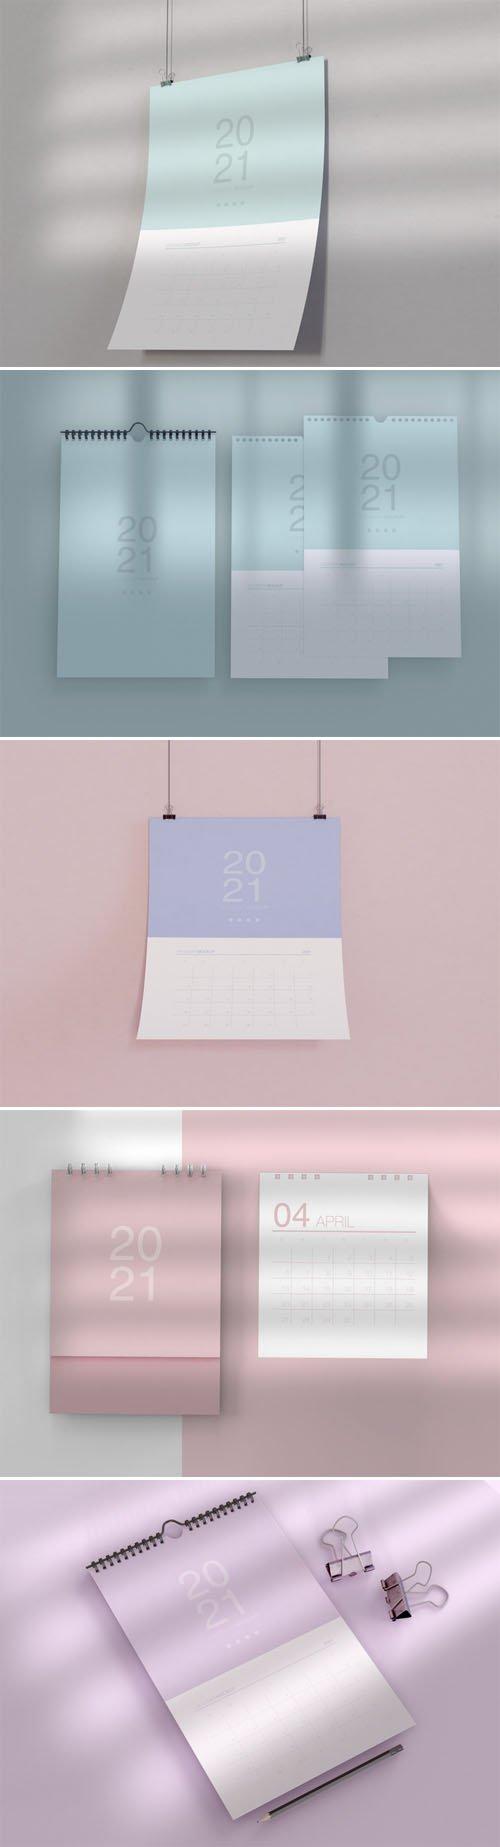 5 Spiral & Wall Calendars PSD Mockups Templates